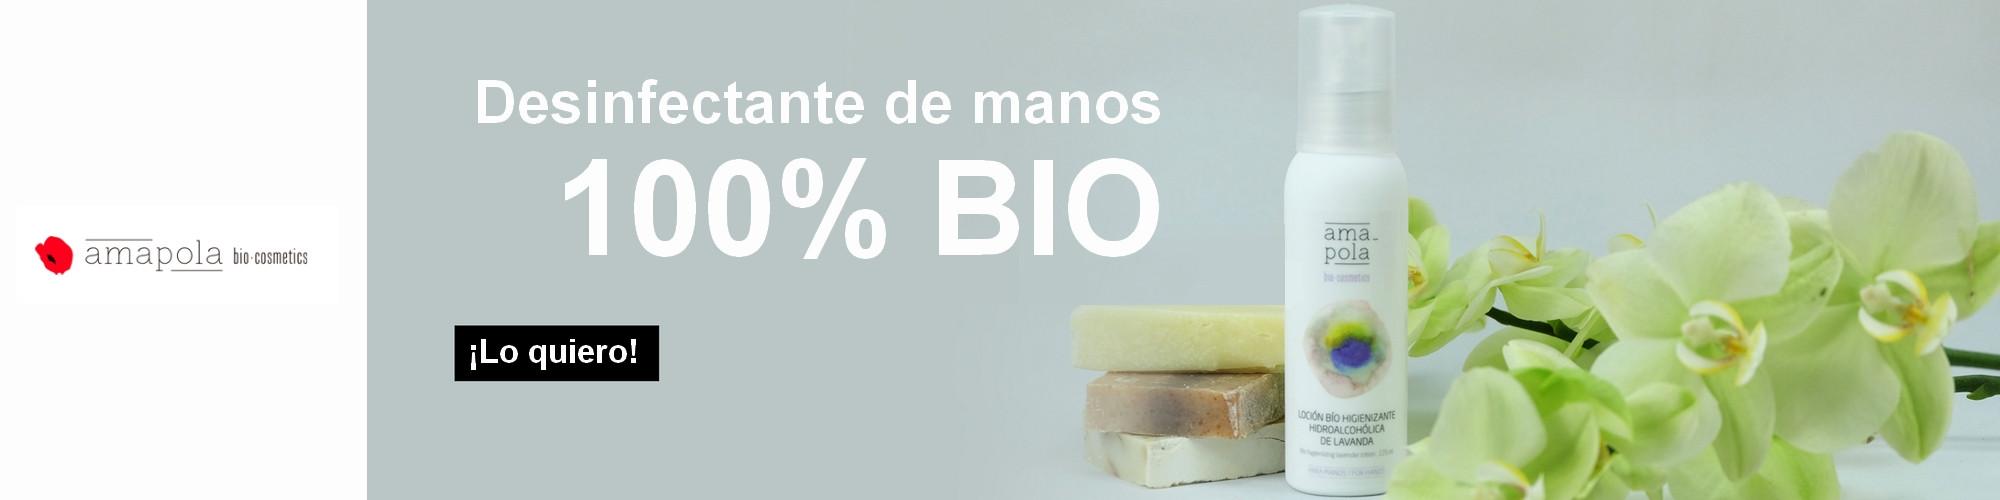 Desinfectante de manos ecológico certificado 100% - Amapola Bio-cosmetics